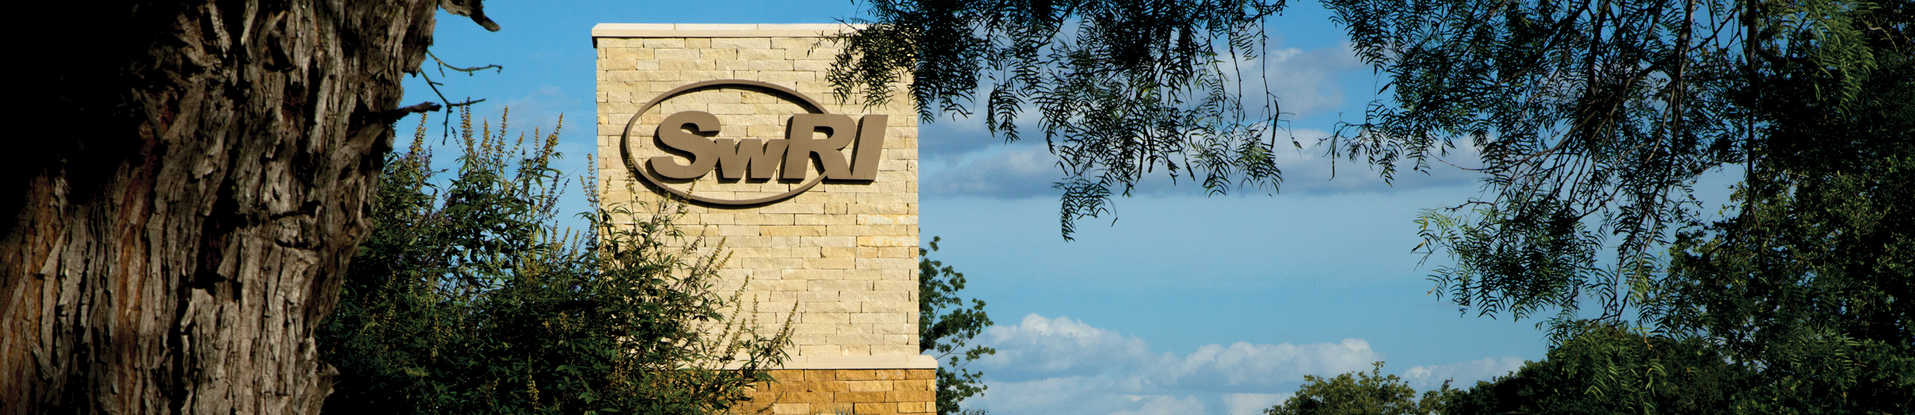 Press Release-SwRI wins two R&D 100 awards